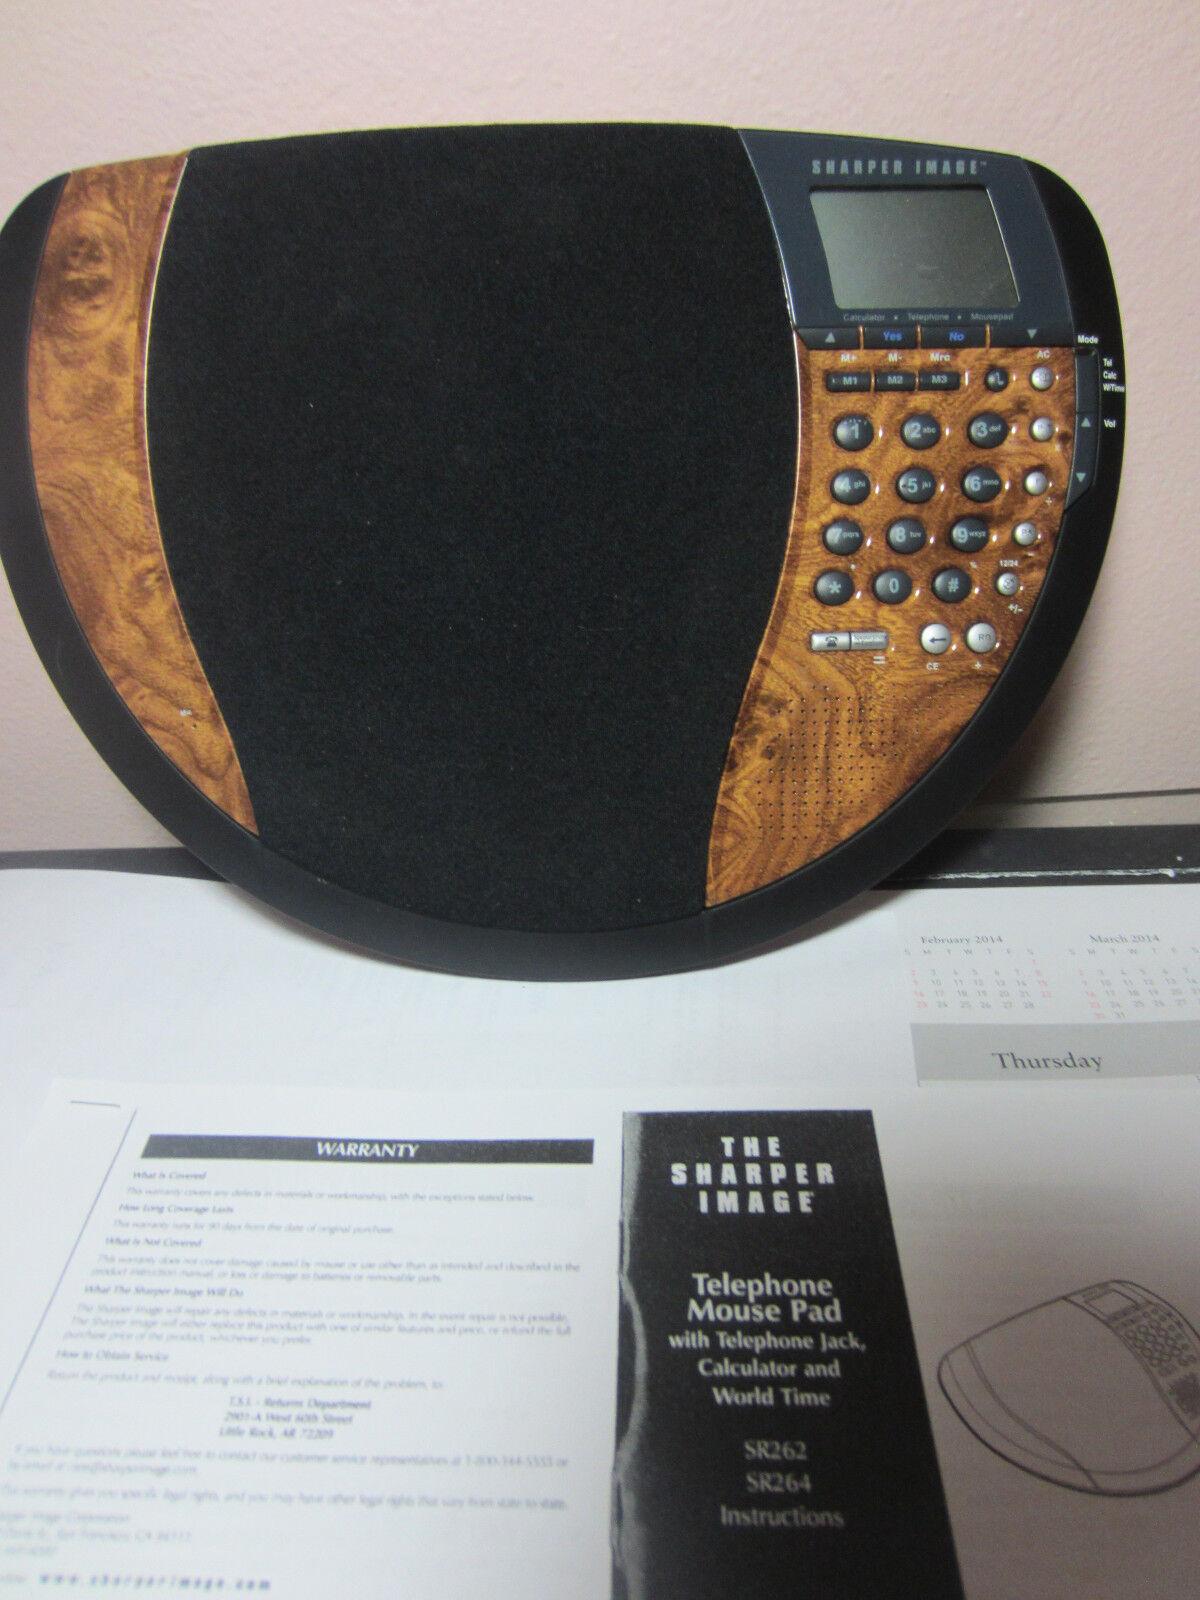 Sharper Image Telephone Mouse Pad Clock Calc SR262 Woodgrain # 679 u